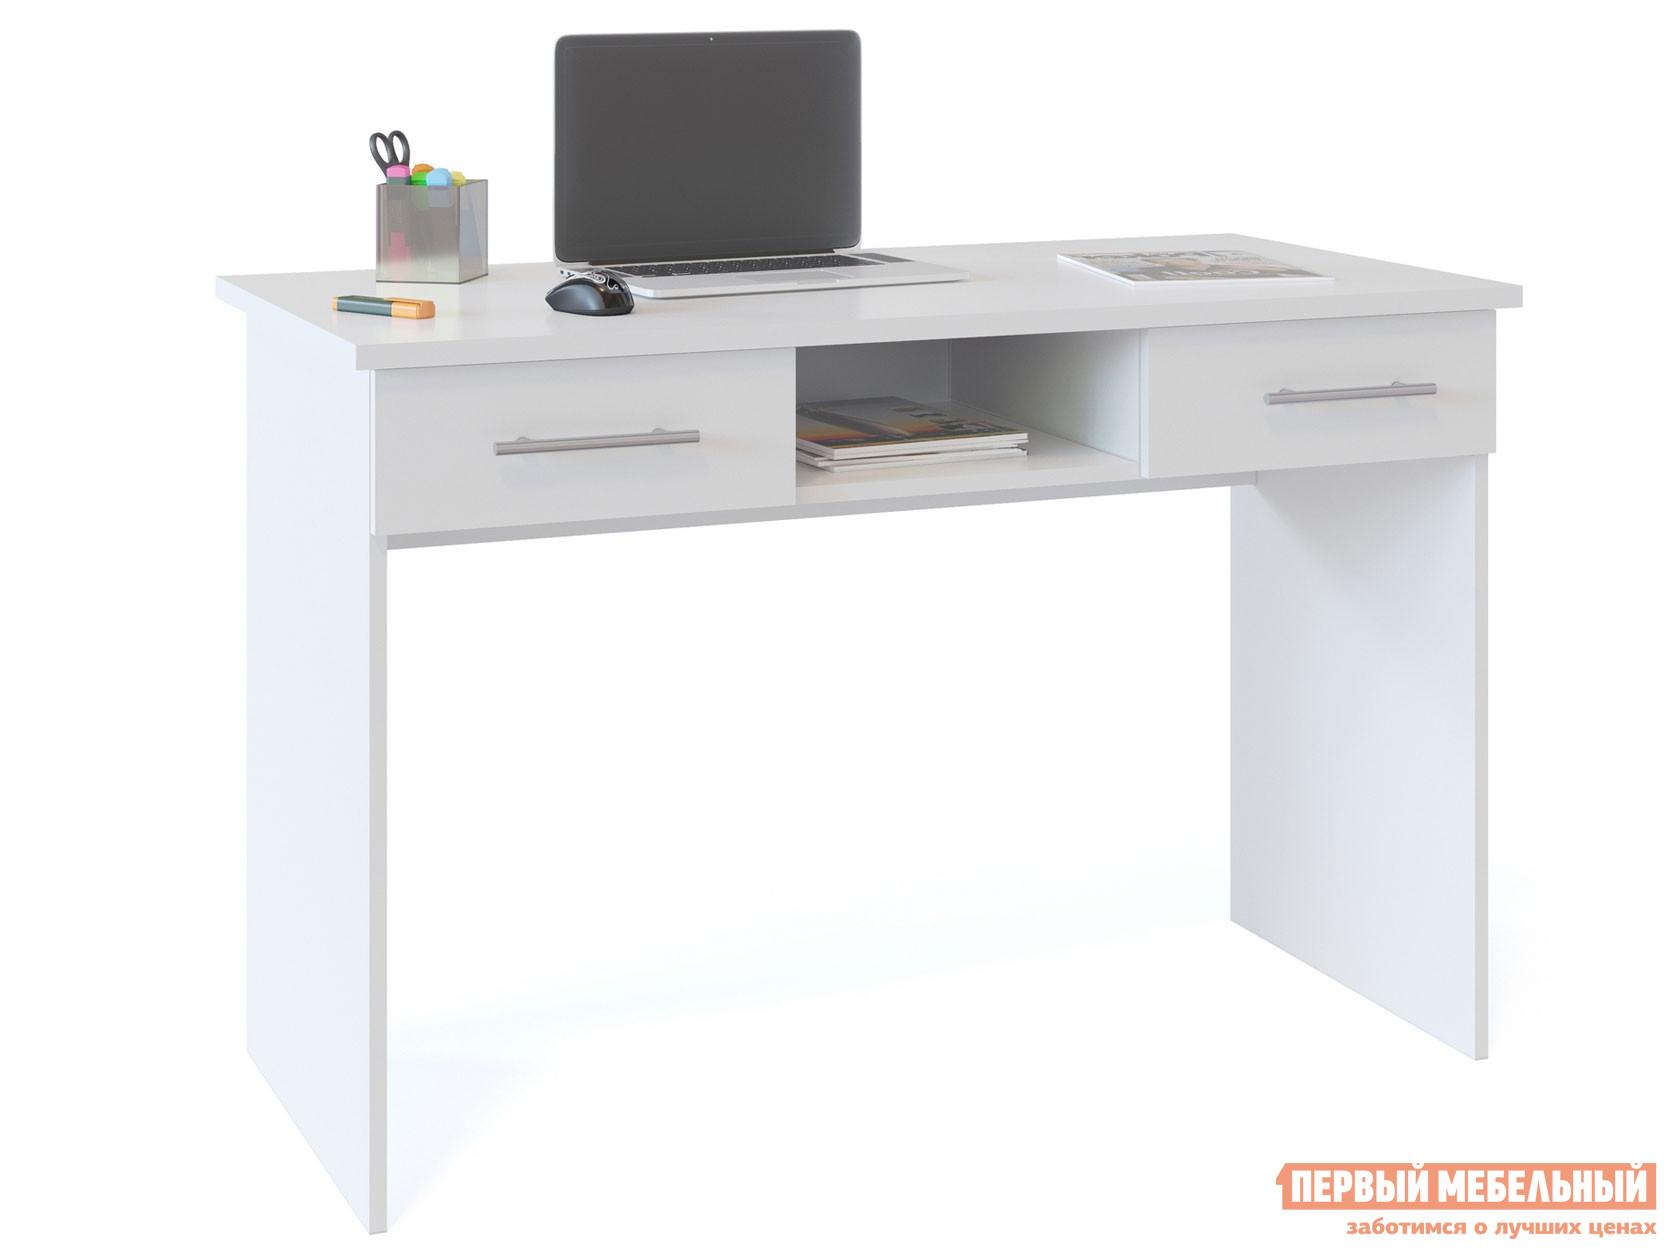 Письменный стол Сокол КСТ-107.1